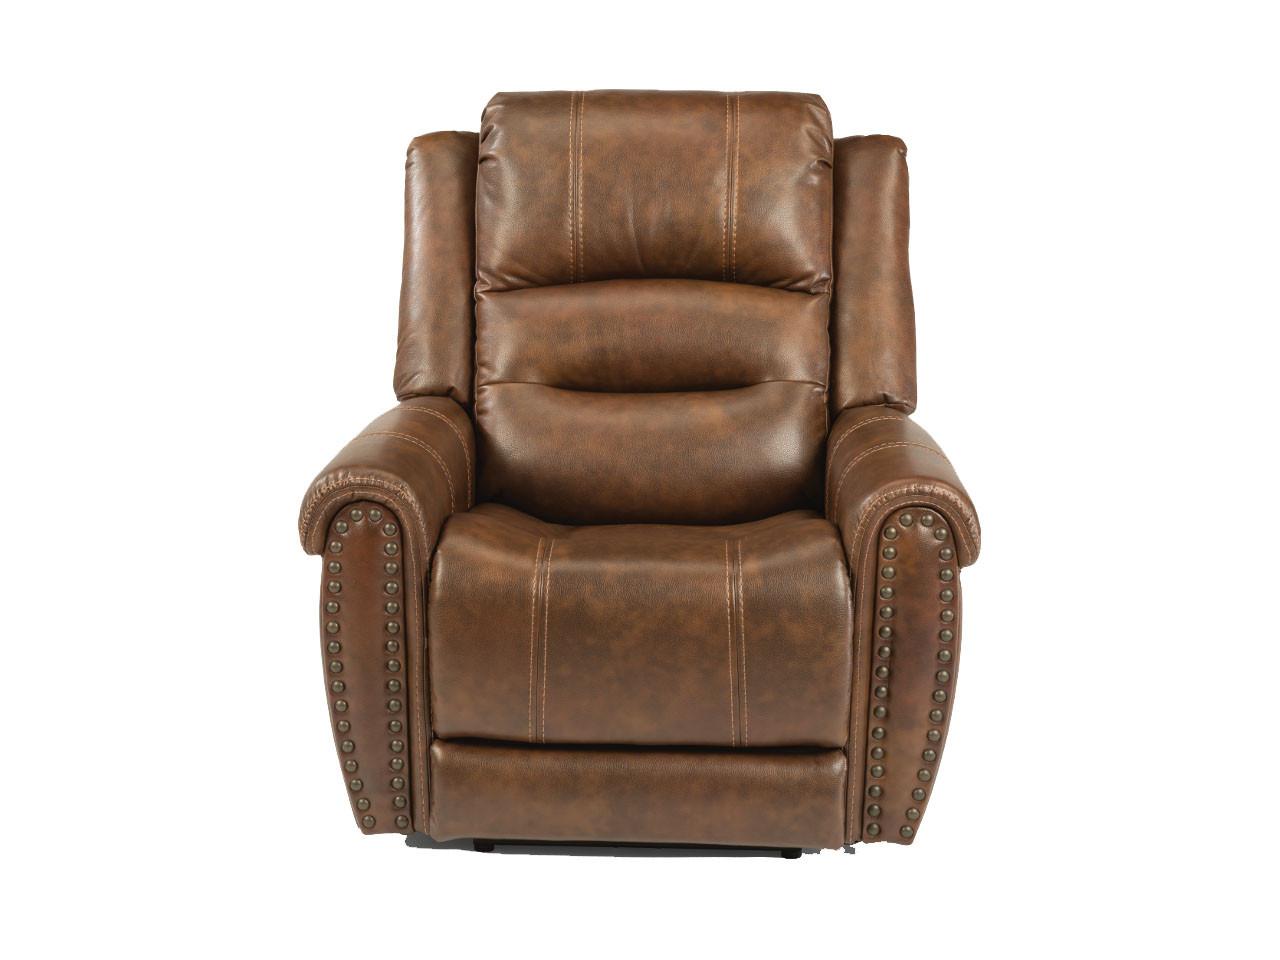 Oscar Leather Recliner